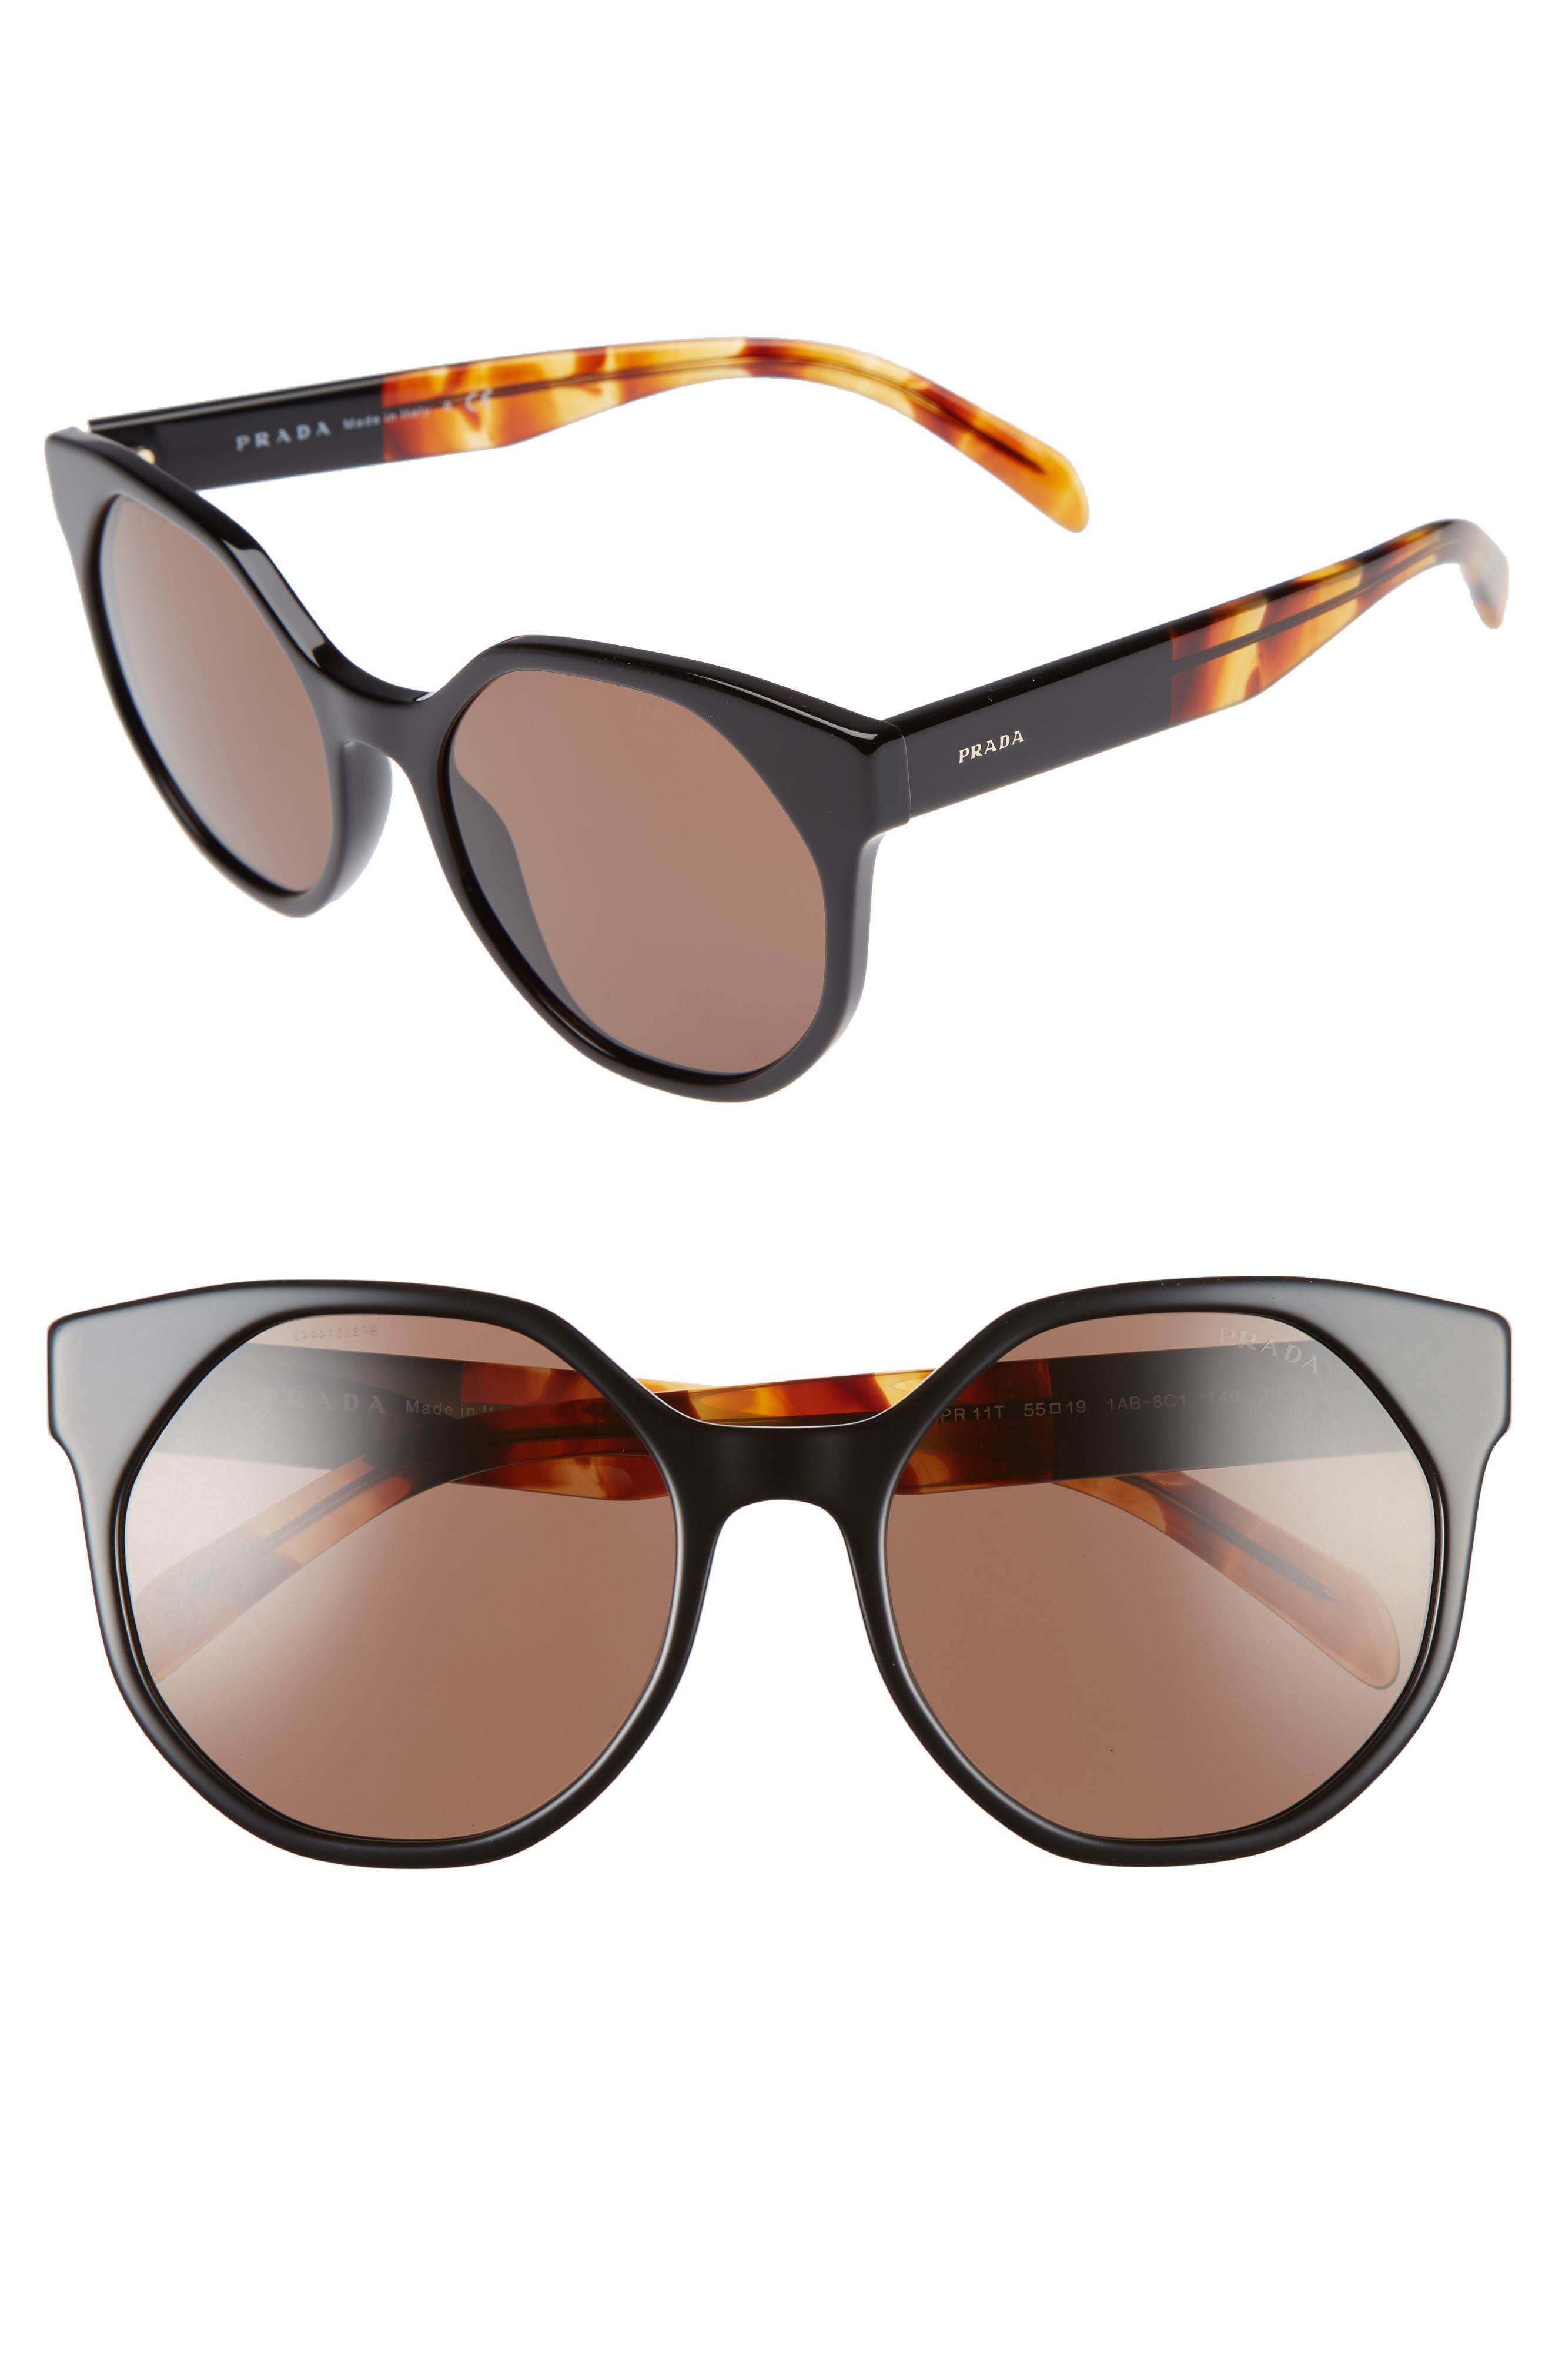 Prada 55mm Retro Sunglasses